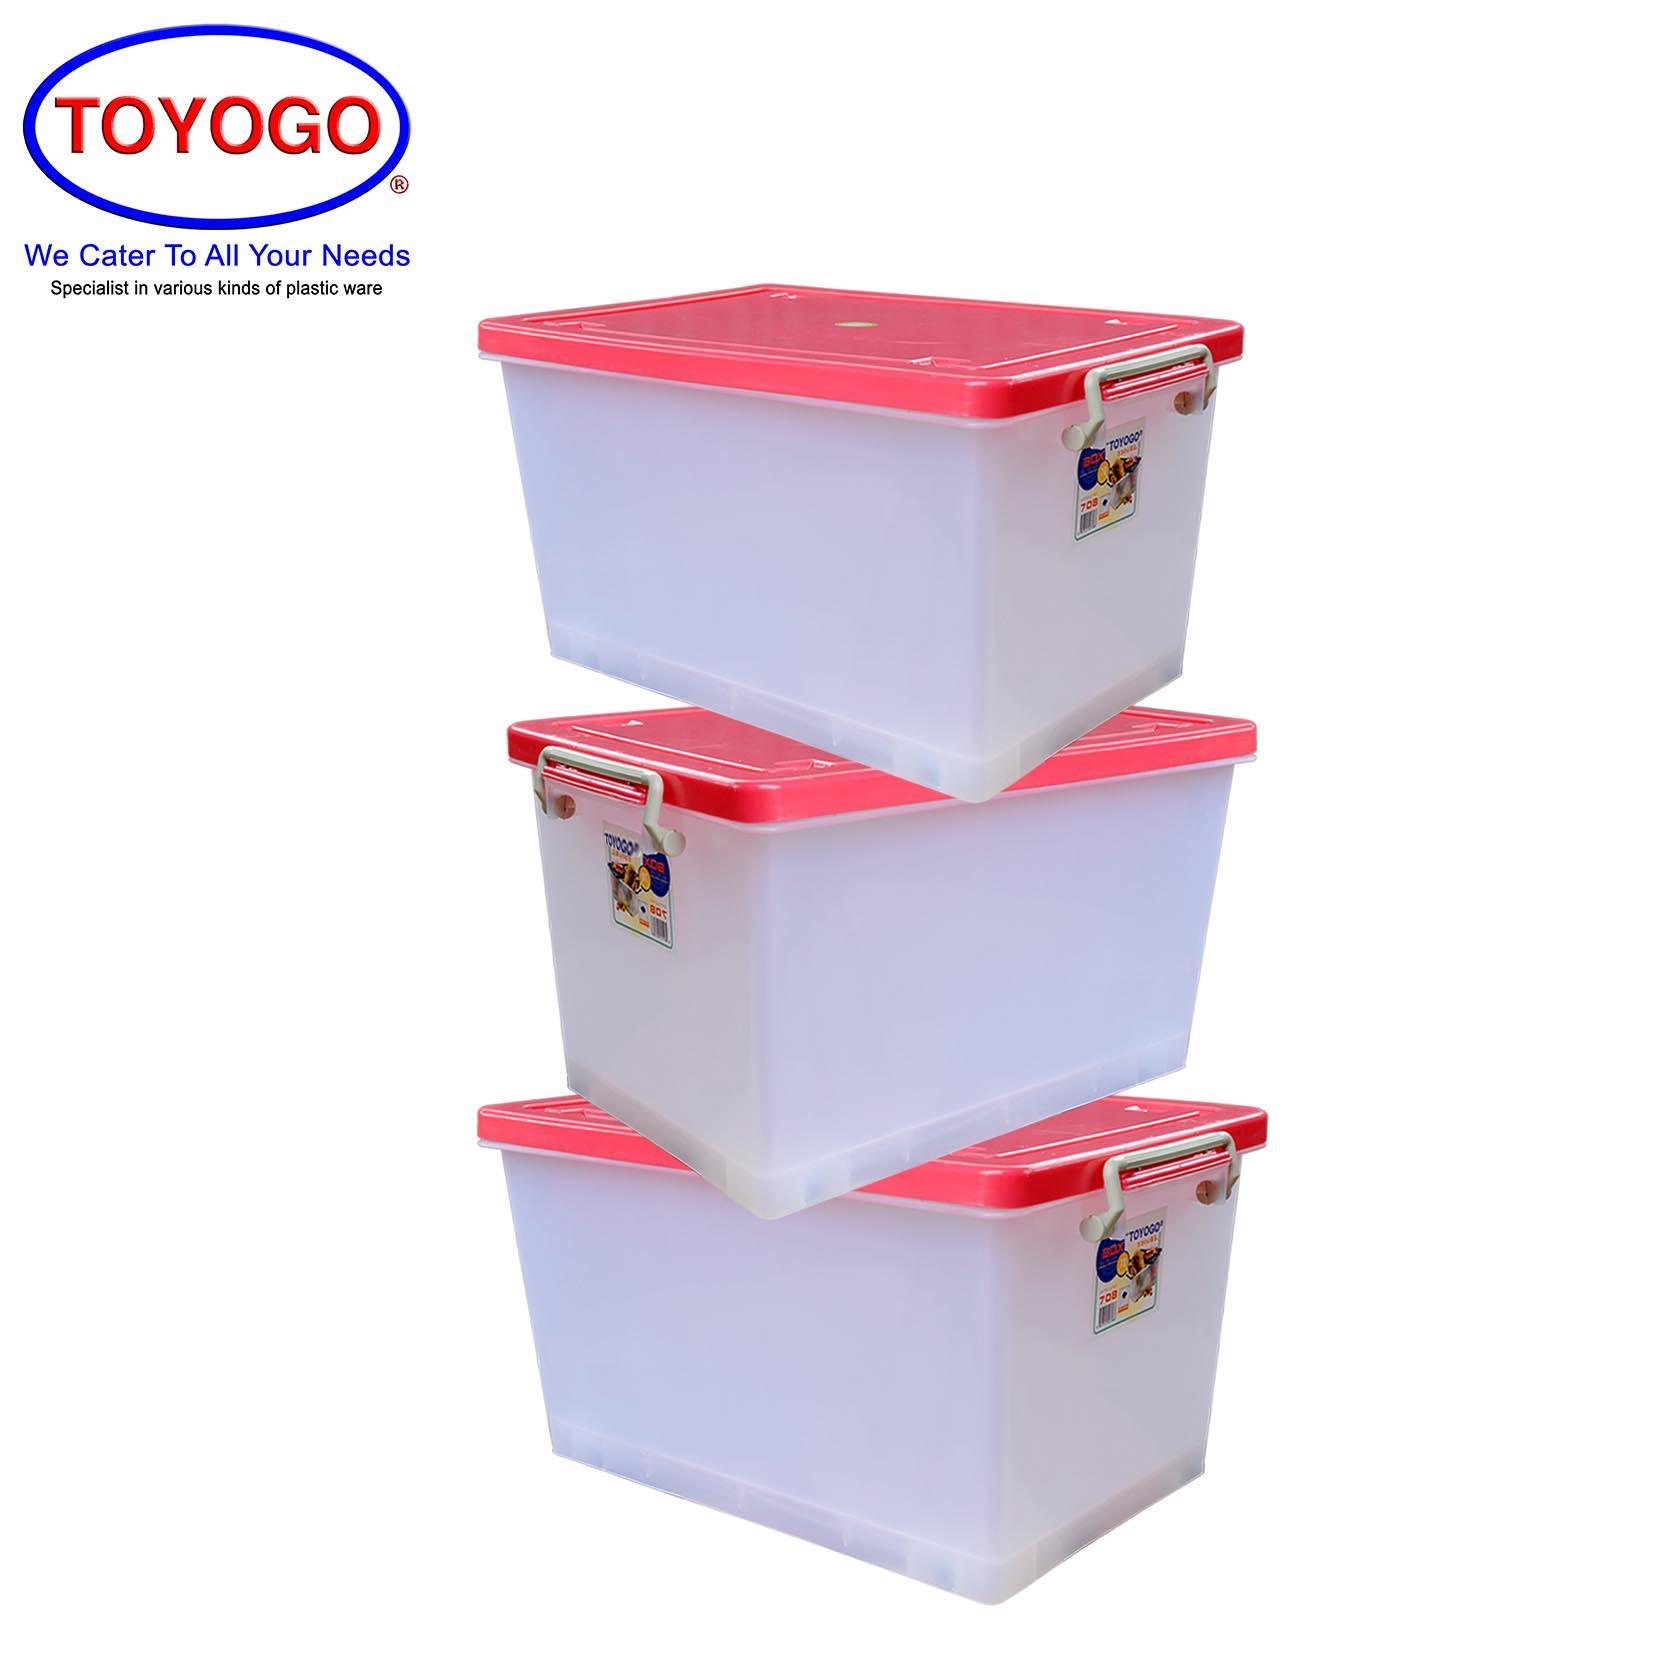 Toyogo Storage Box With Wheels (Bundle of 3) (708)